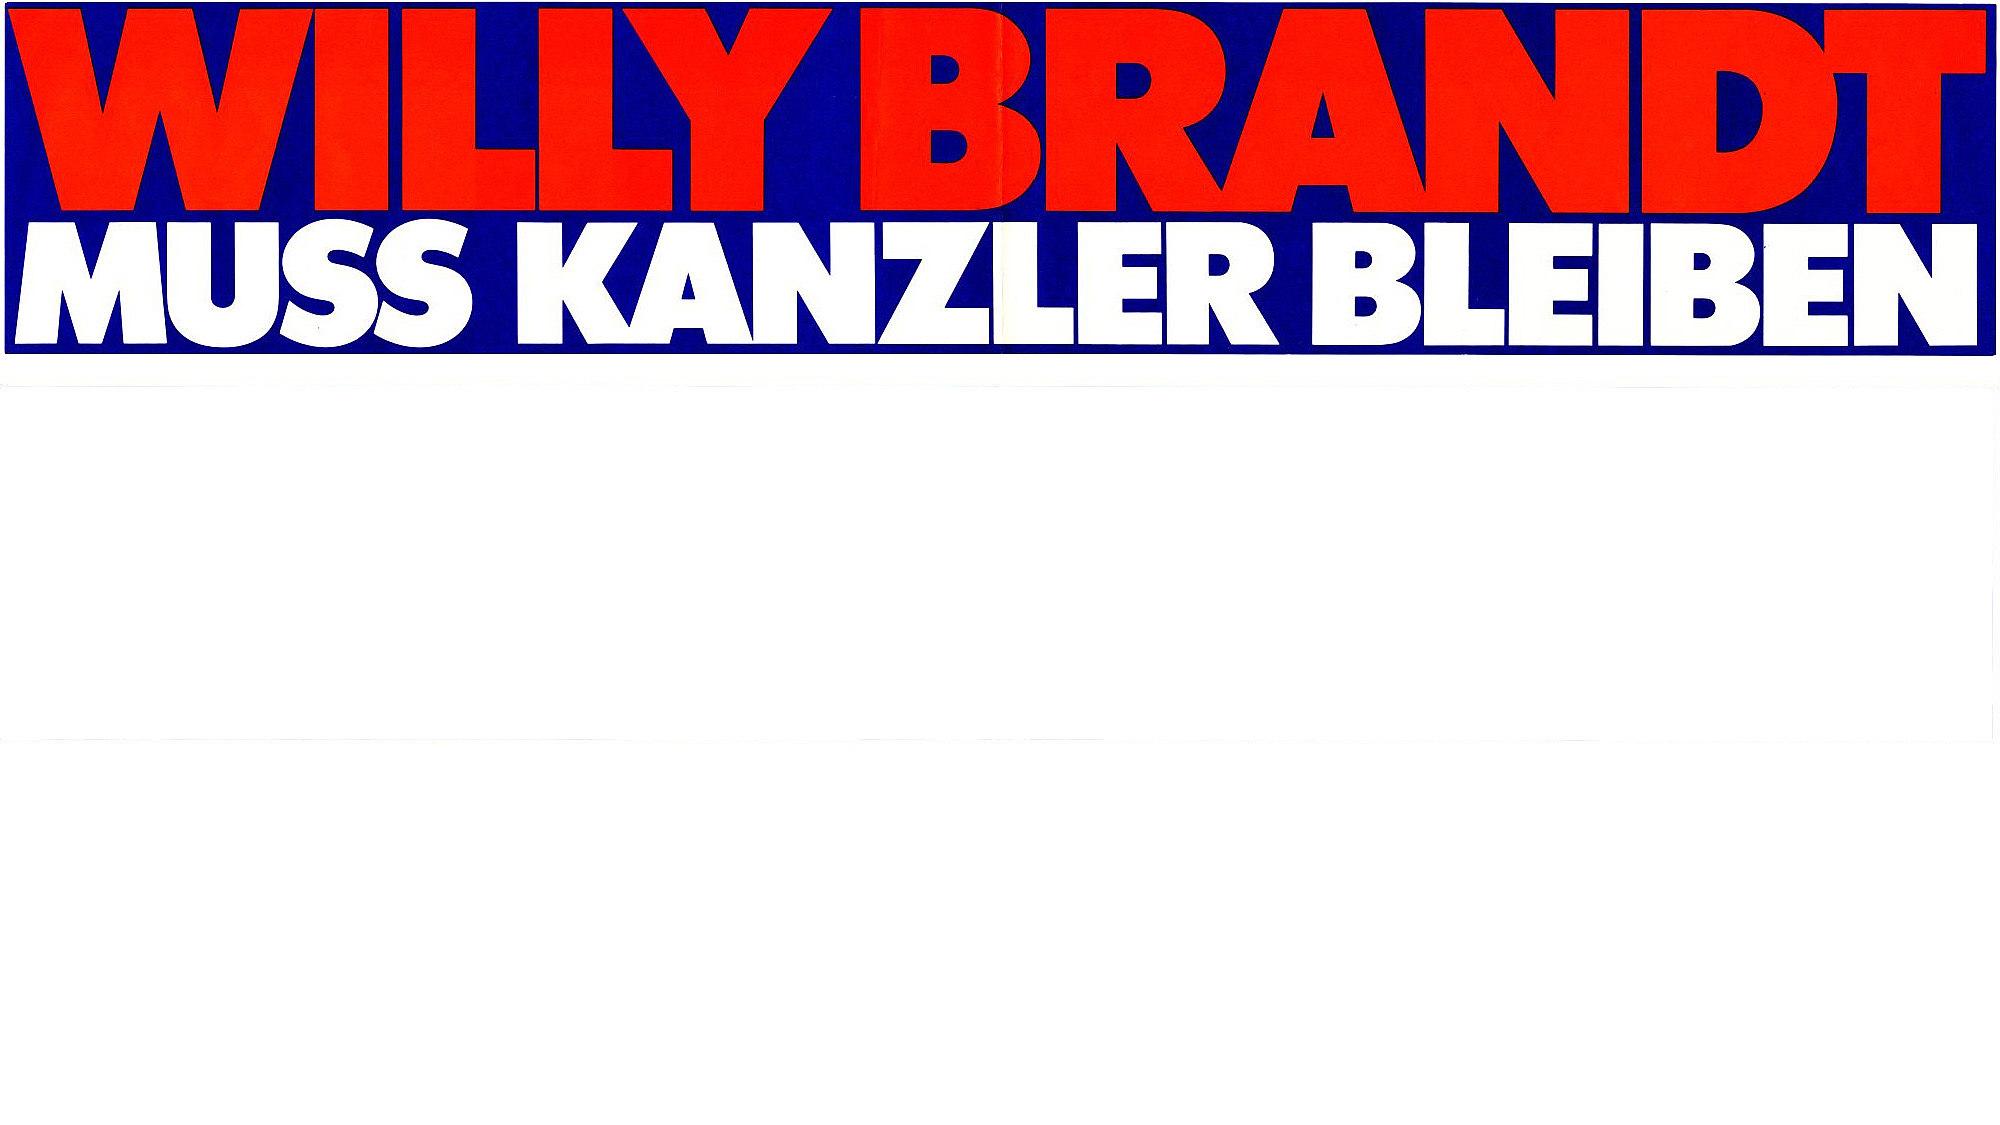 Poster band: 'Willy Brandt muss Kanzler bleiben', 1972